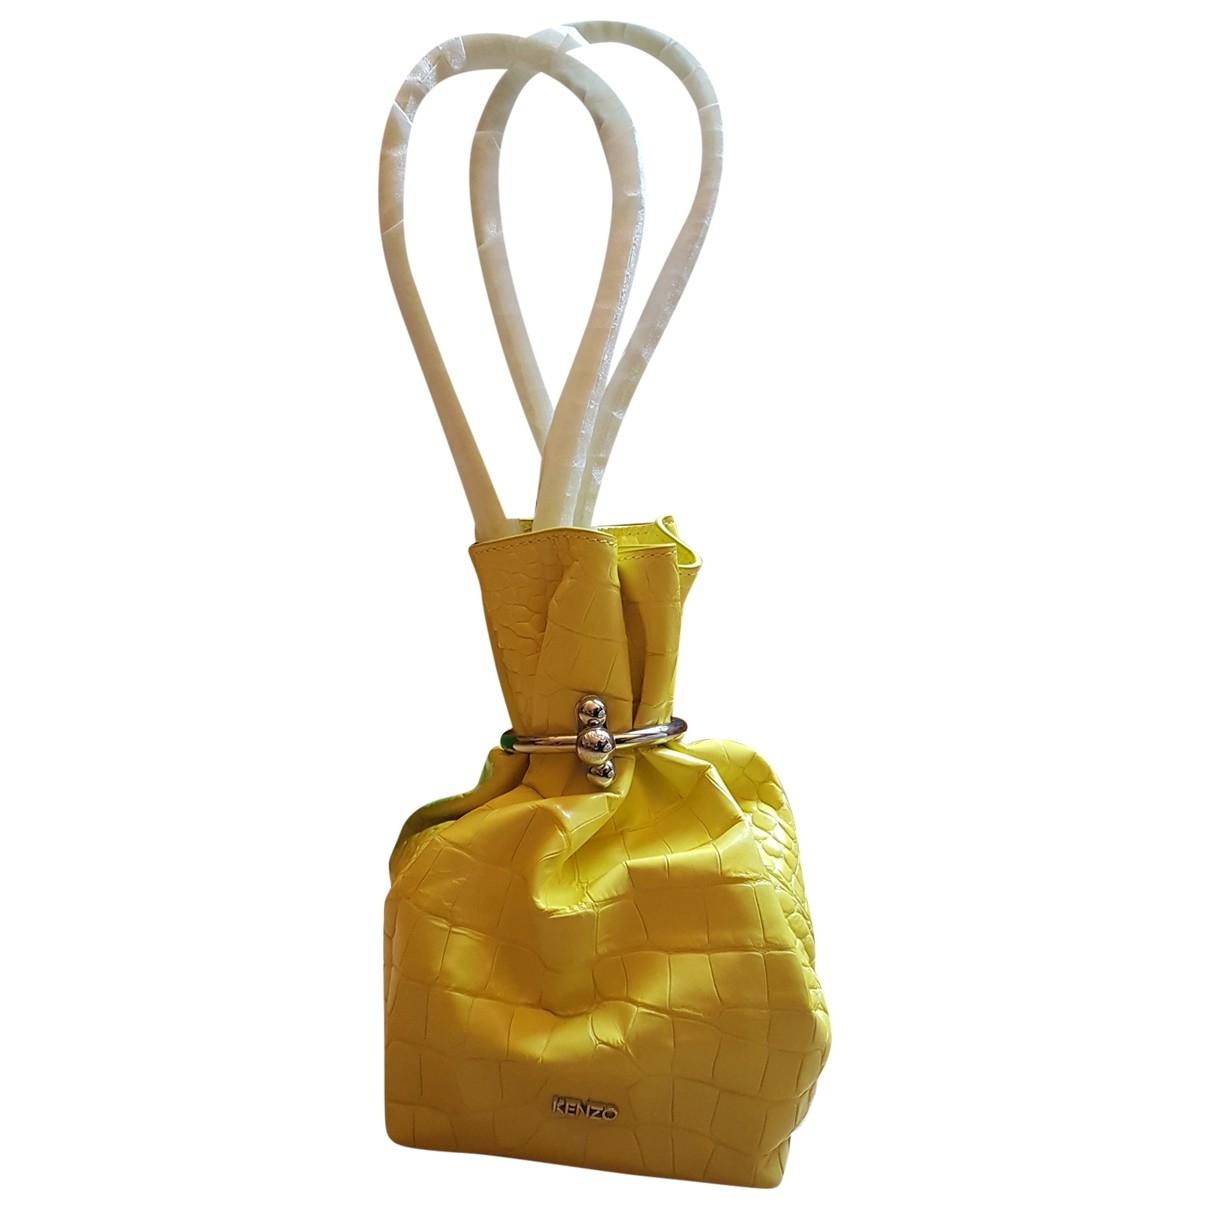 Kenzo \N Handtasche in  Gelb Lackleder